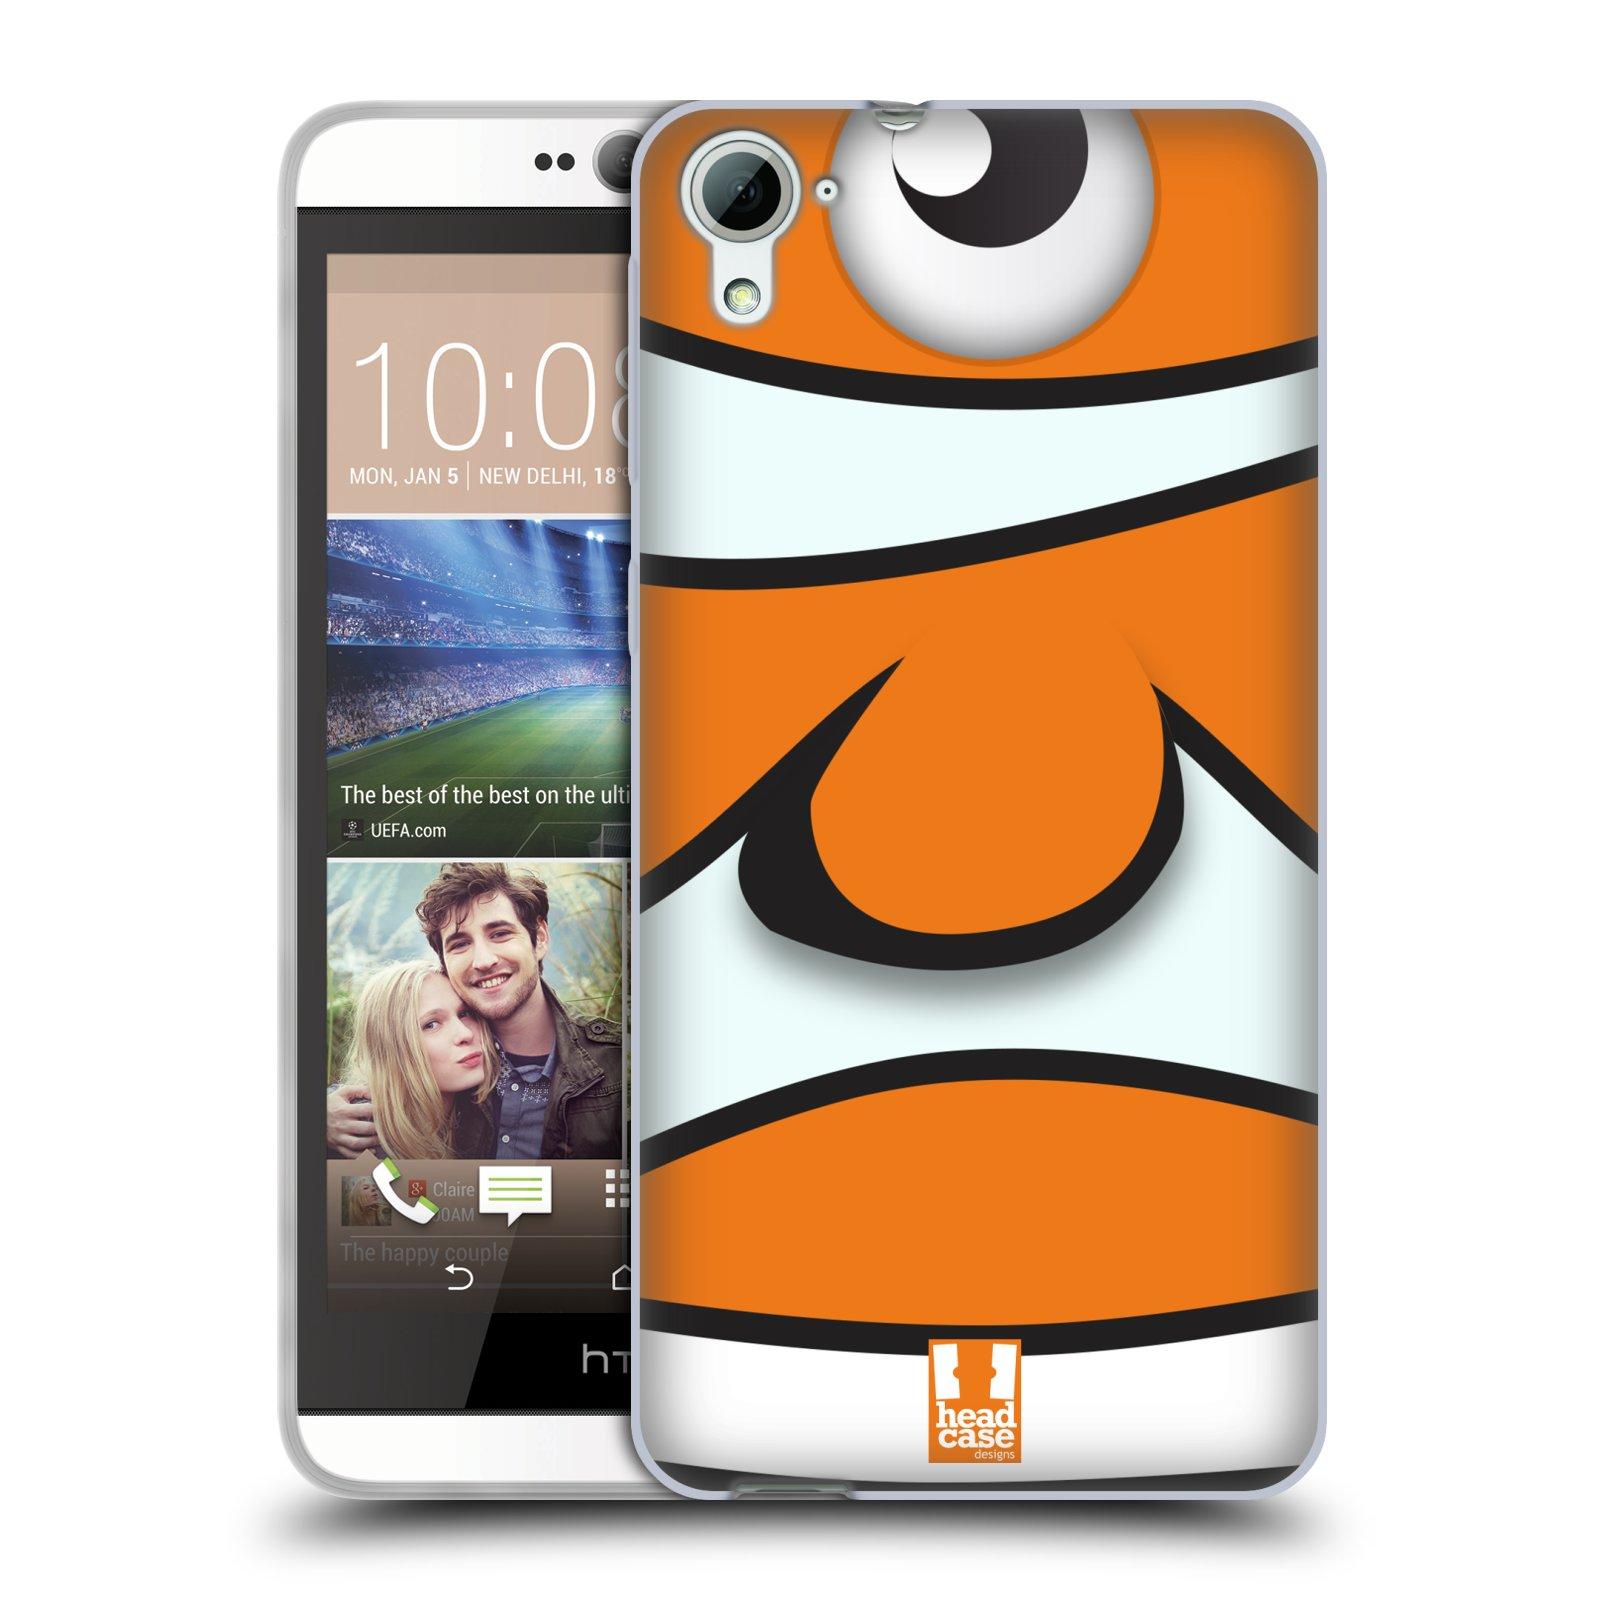 HEAD CASE silikonový obal na mobil HTC DESIRE 826 vzor Rybičky z profilu klaun oranžová NEMO